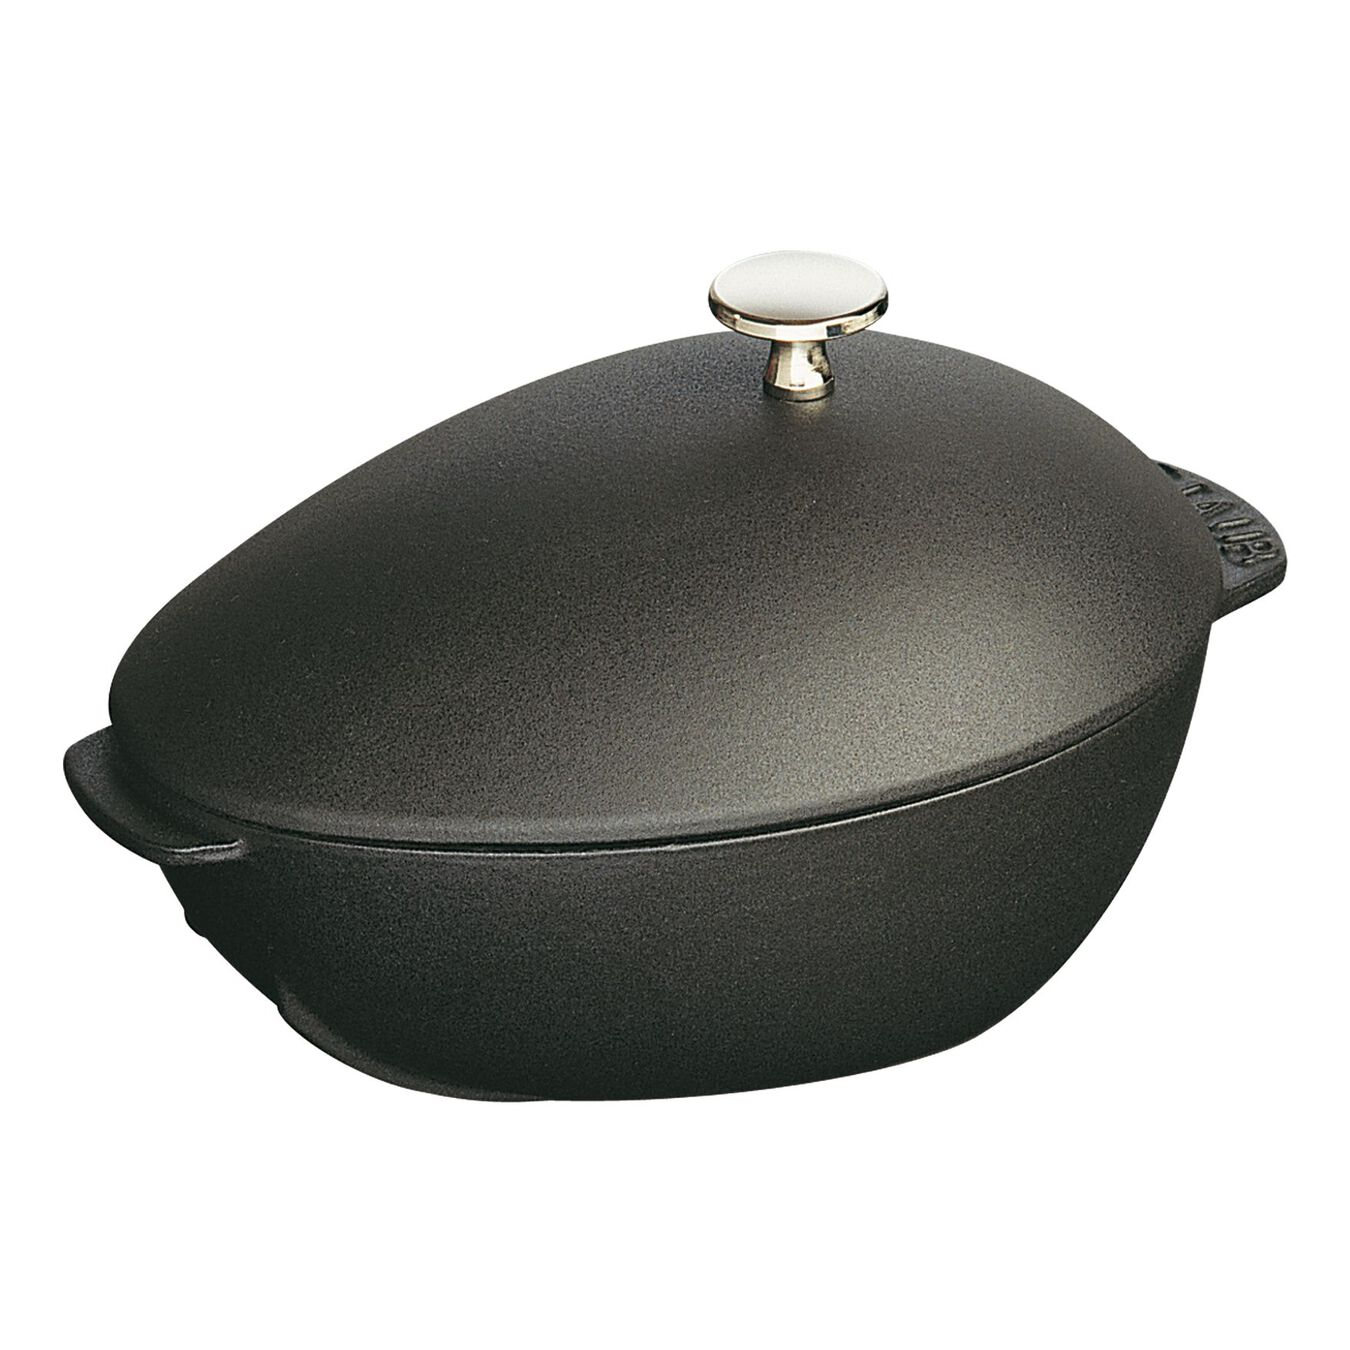 Cozziera ovale - 25 cm, nero,,large 3